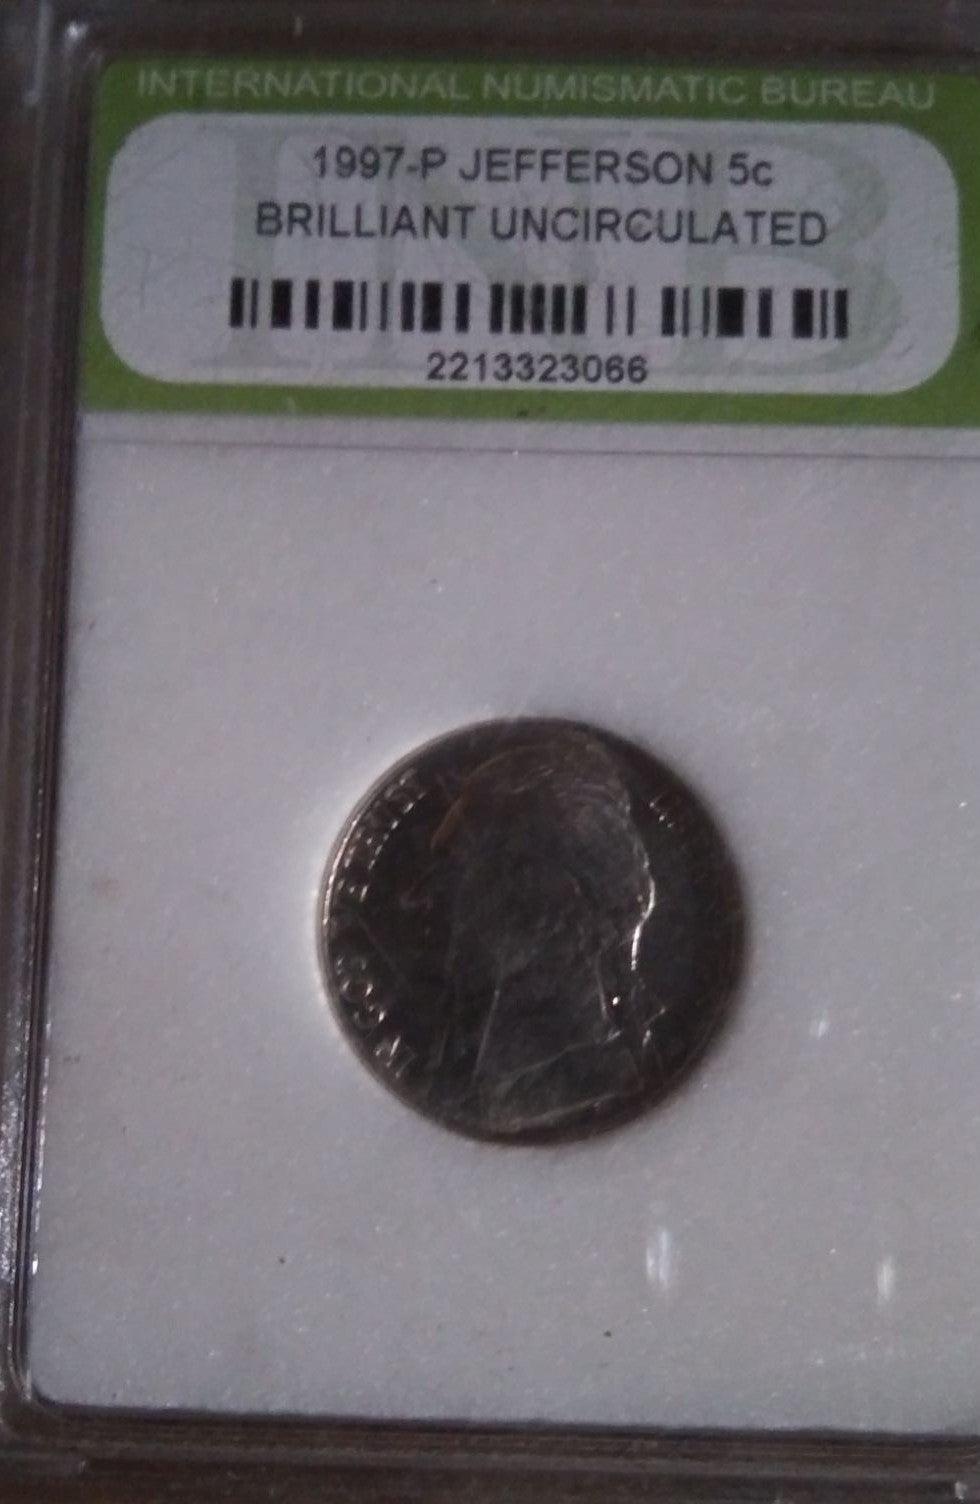 Uncirculated nickel